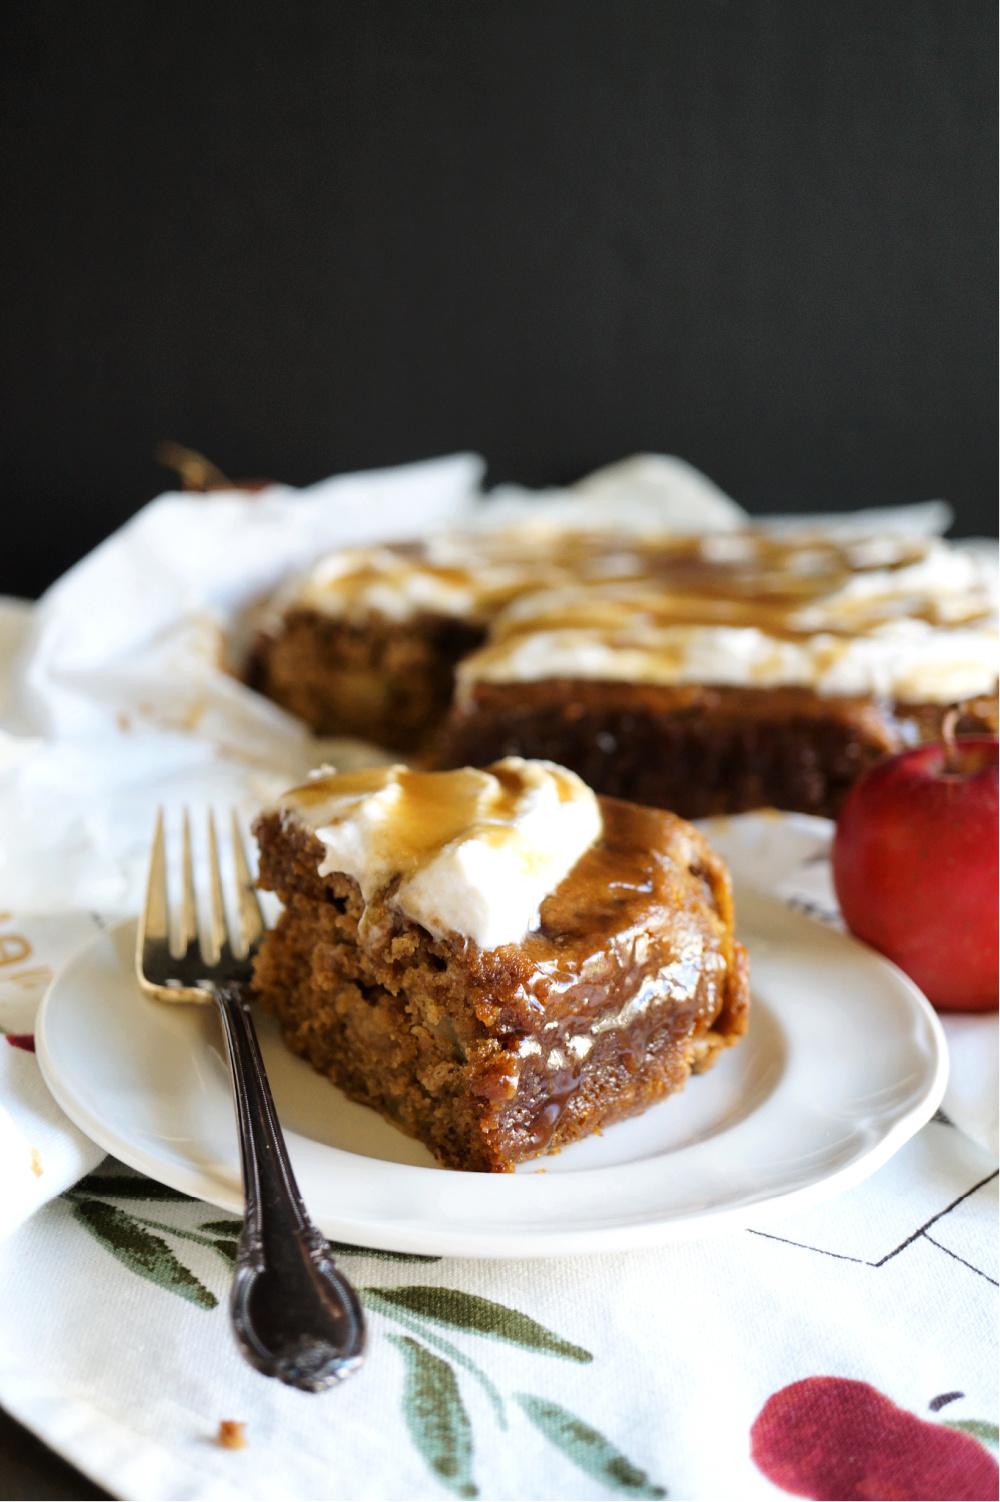 salted caramel apple cake slice on a plate